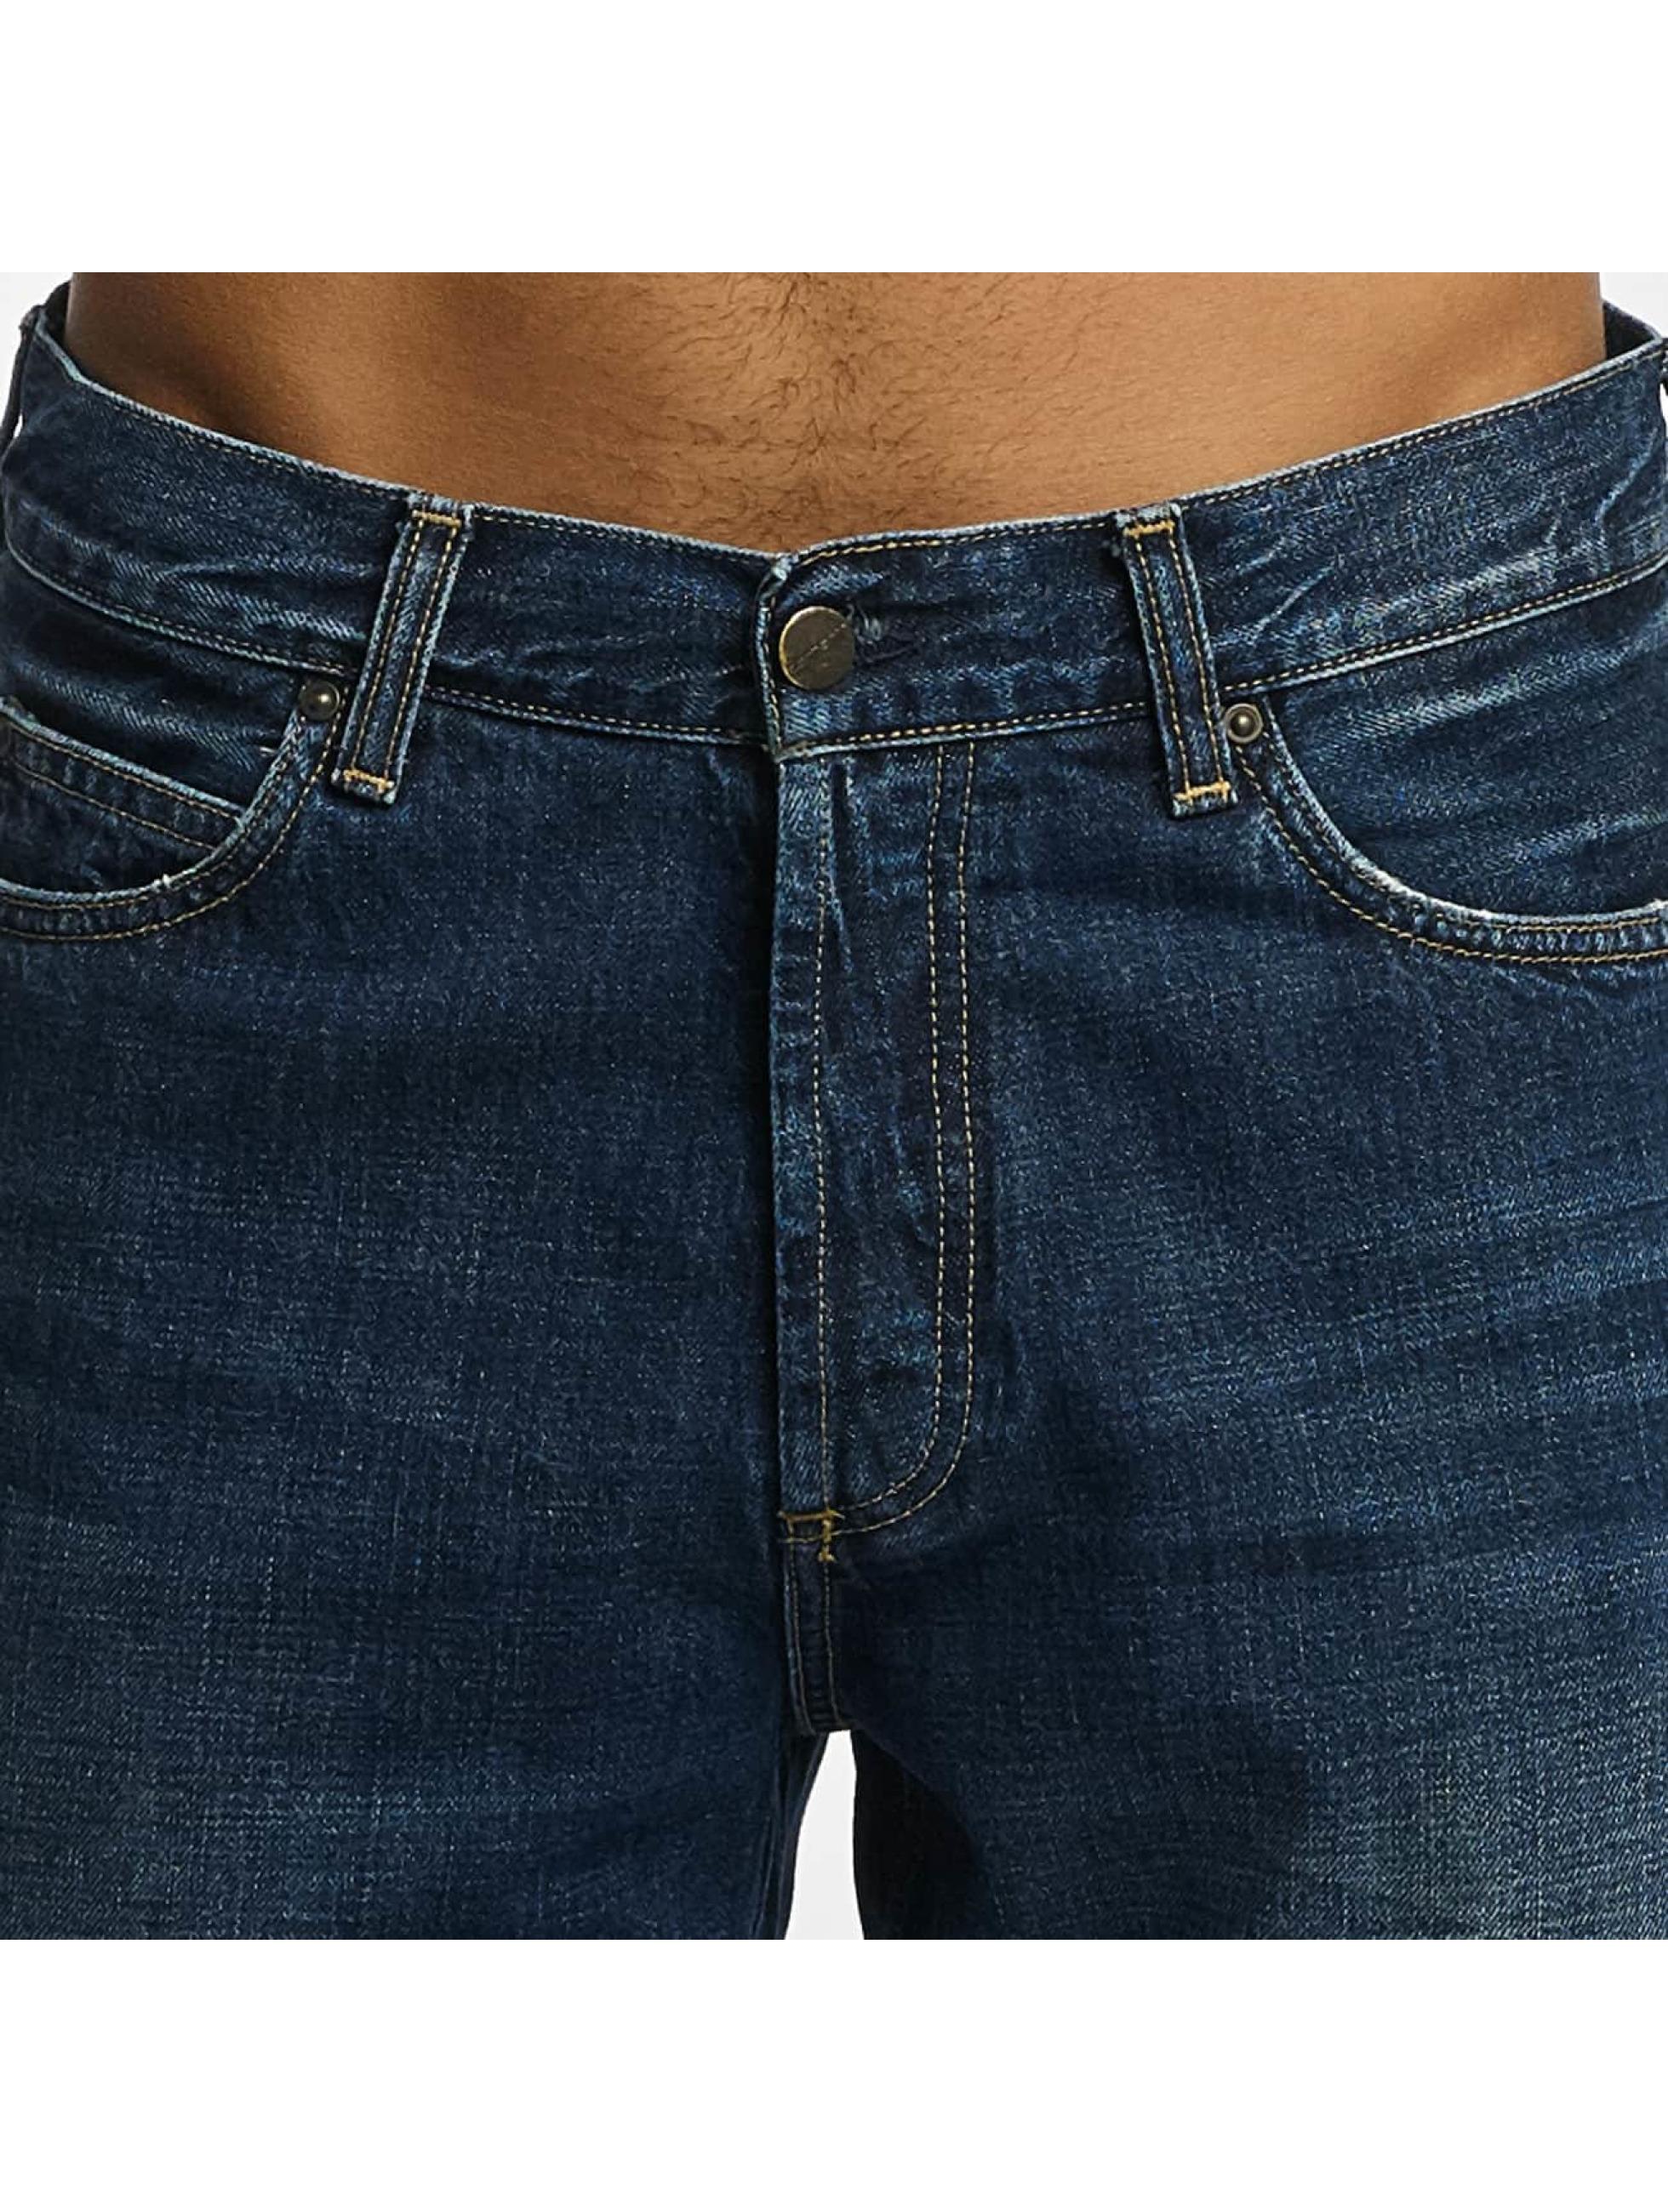 Carhartt WIP Dżinsy straight fit Edgewood Marlow niebieski